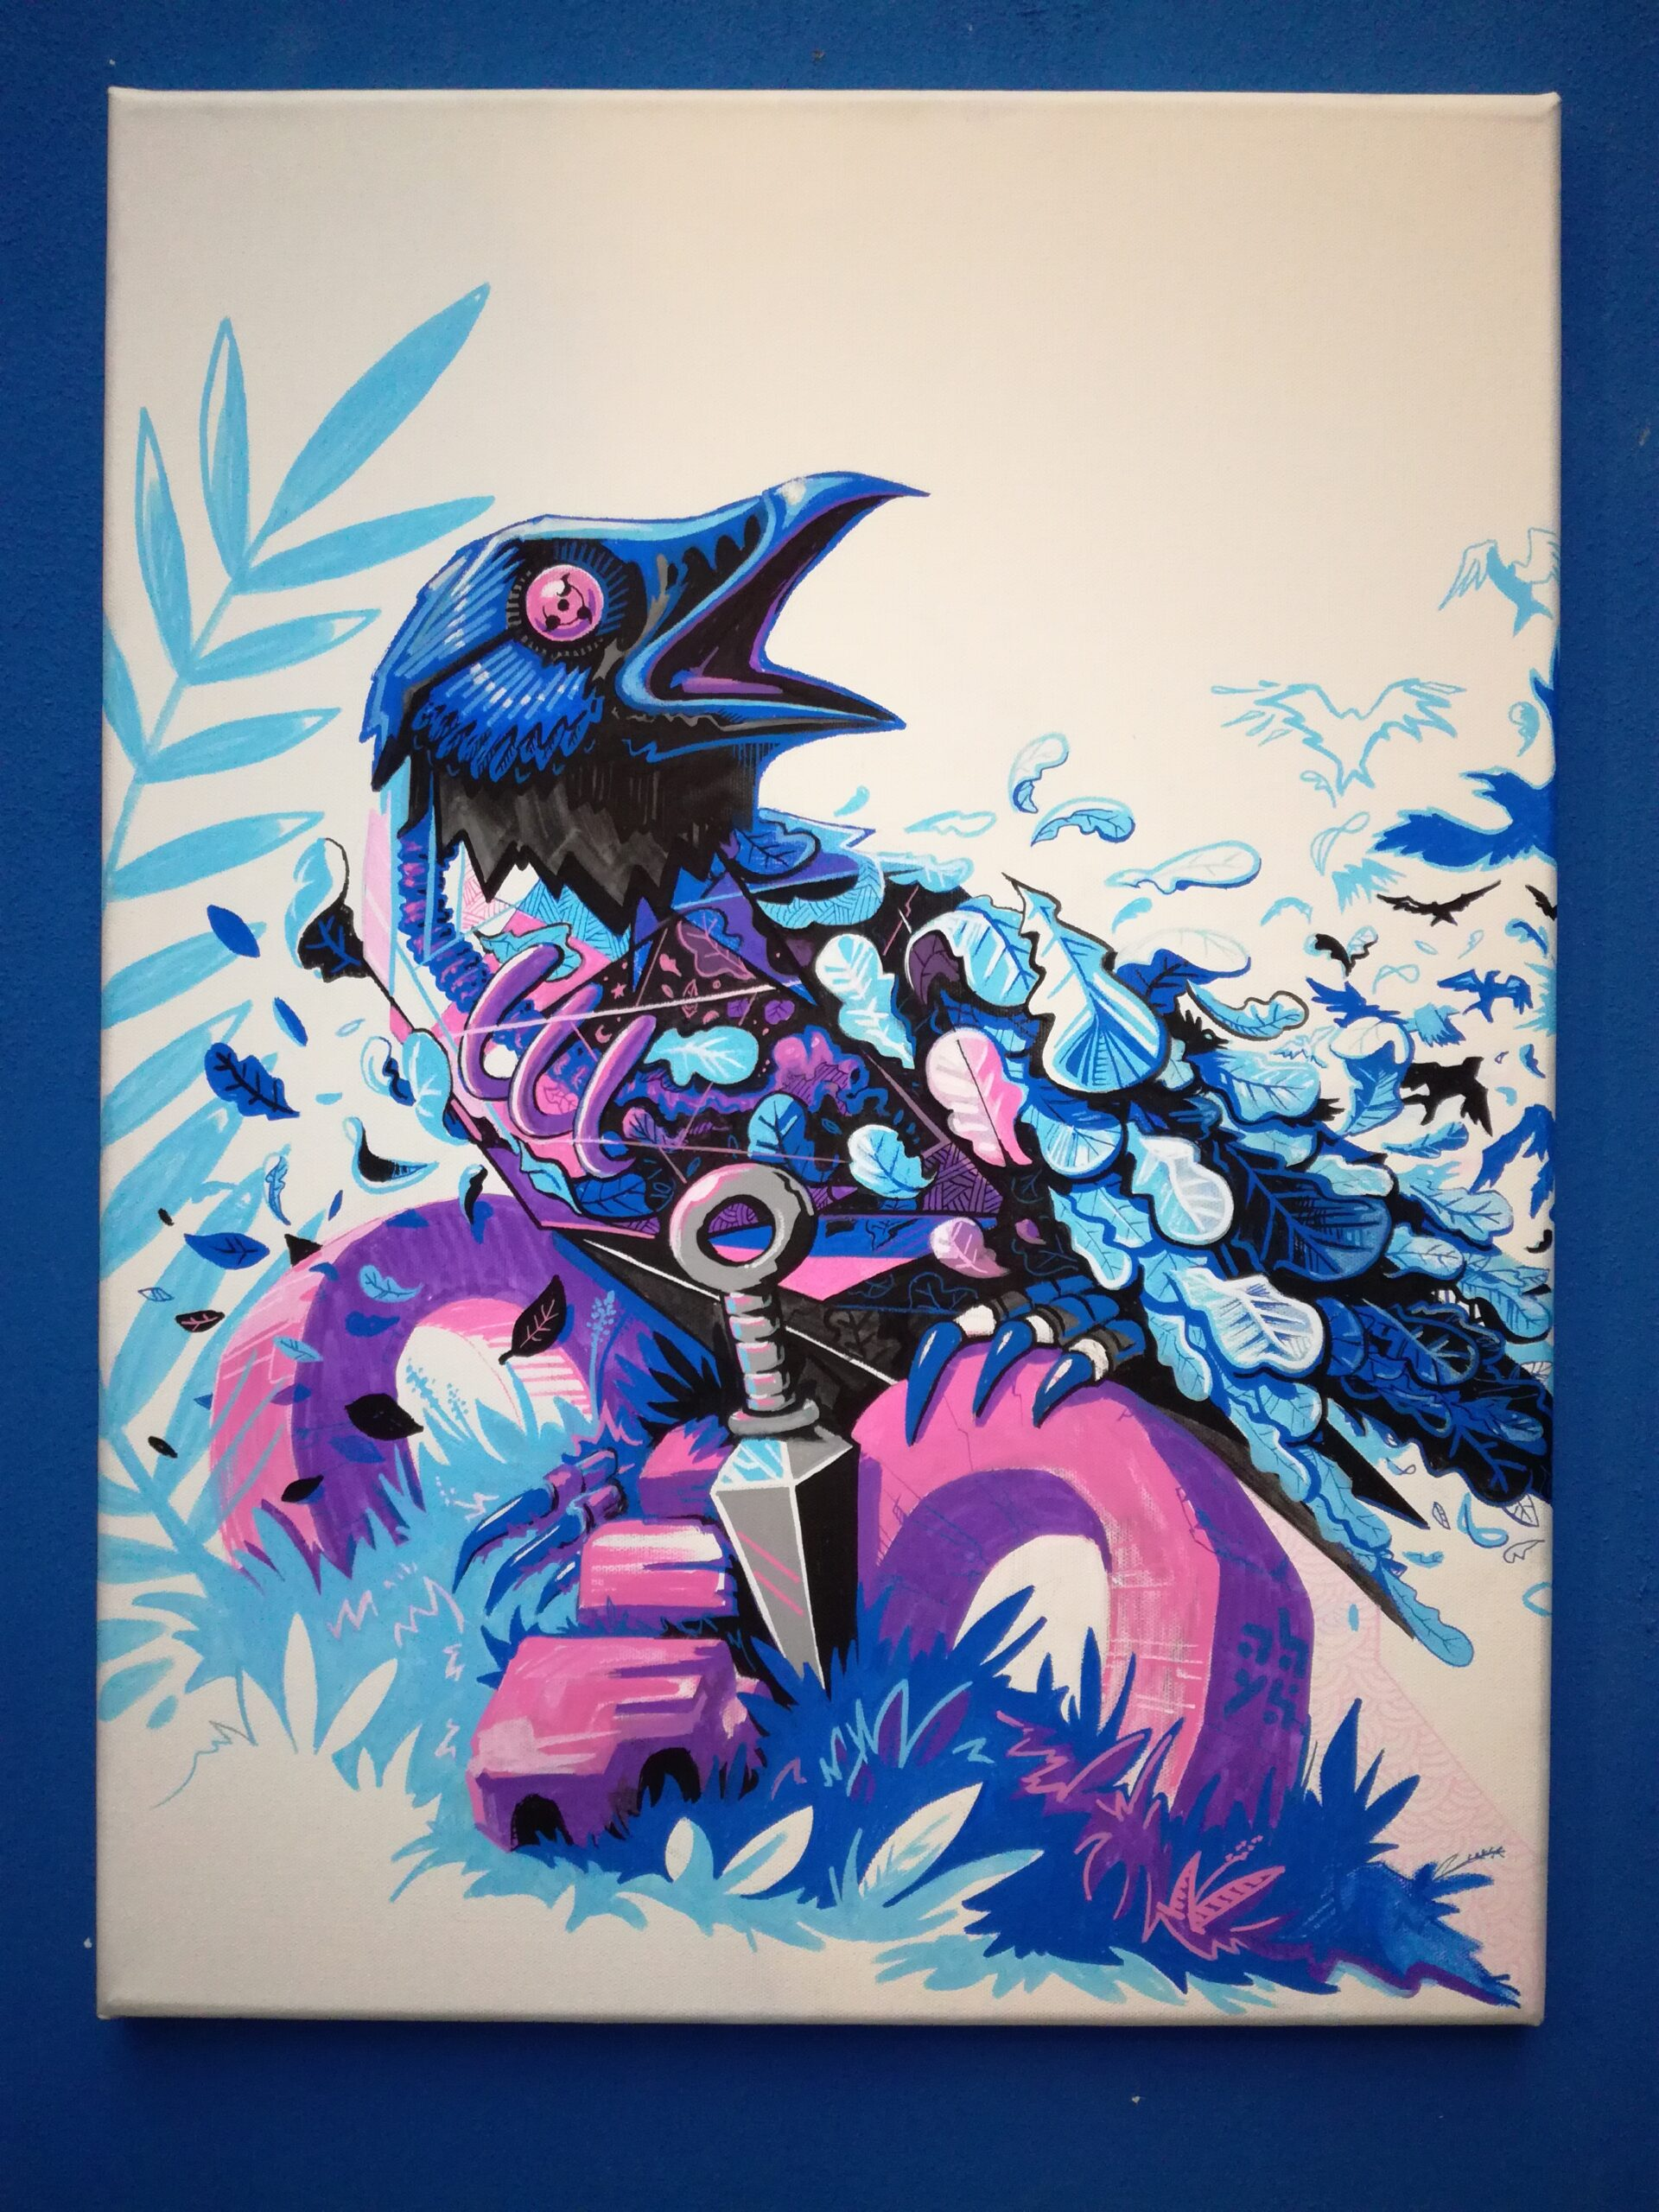 corbeau - végétal - métaflaune toile illustration - street art abys2fly